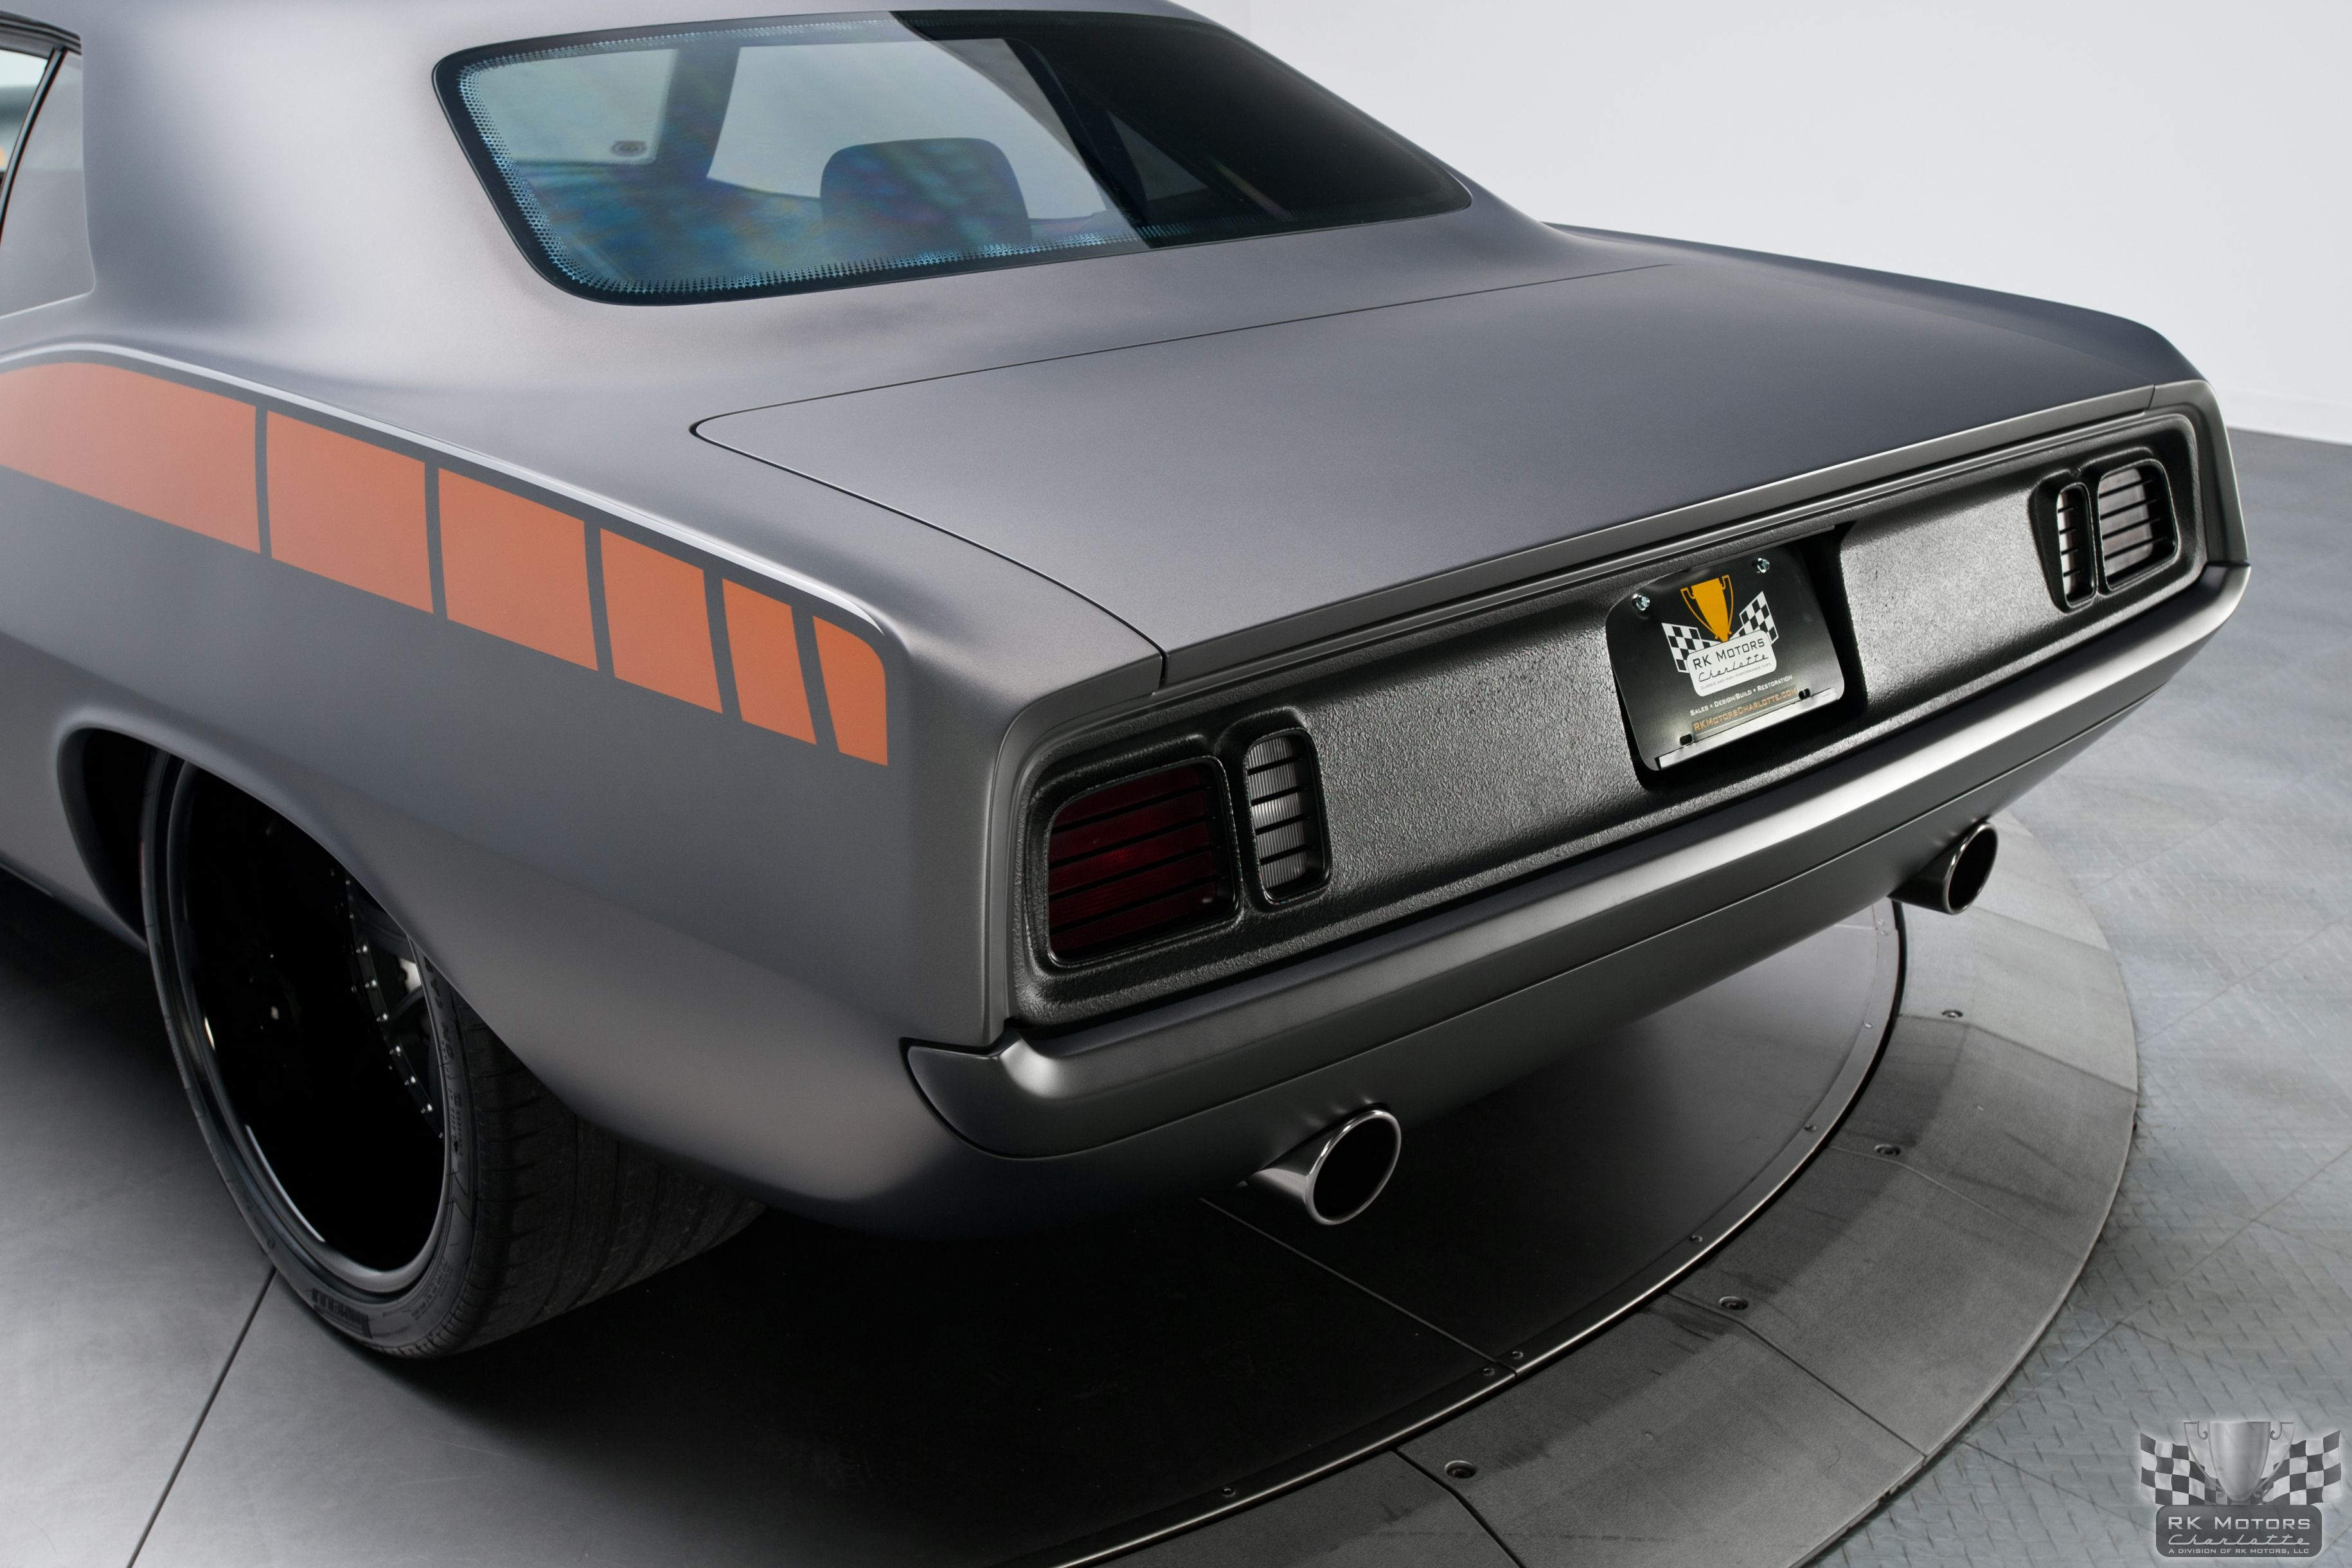 Dark Charcoal Paint Color Flat Color Graphics Http Www Rkmotorscharlotte Com Sales Inventory Active 1971 Plymouth Cuda 134076 Photo Inspiration Photo Car